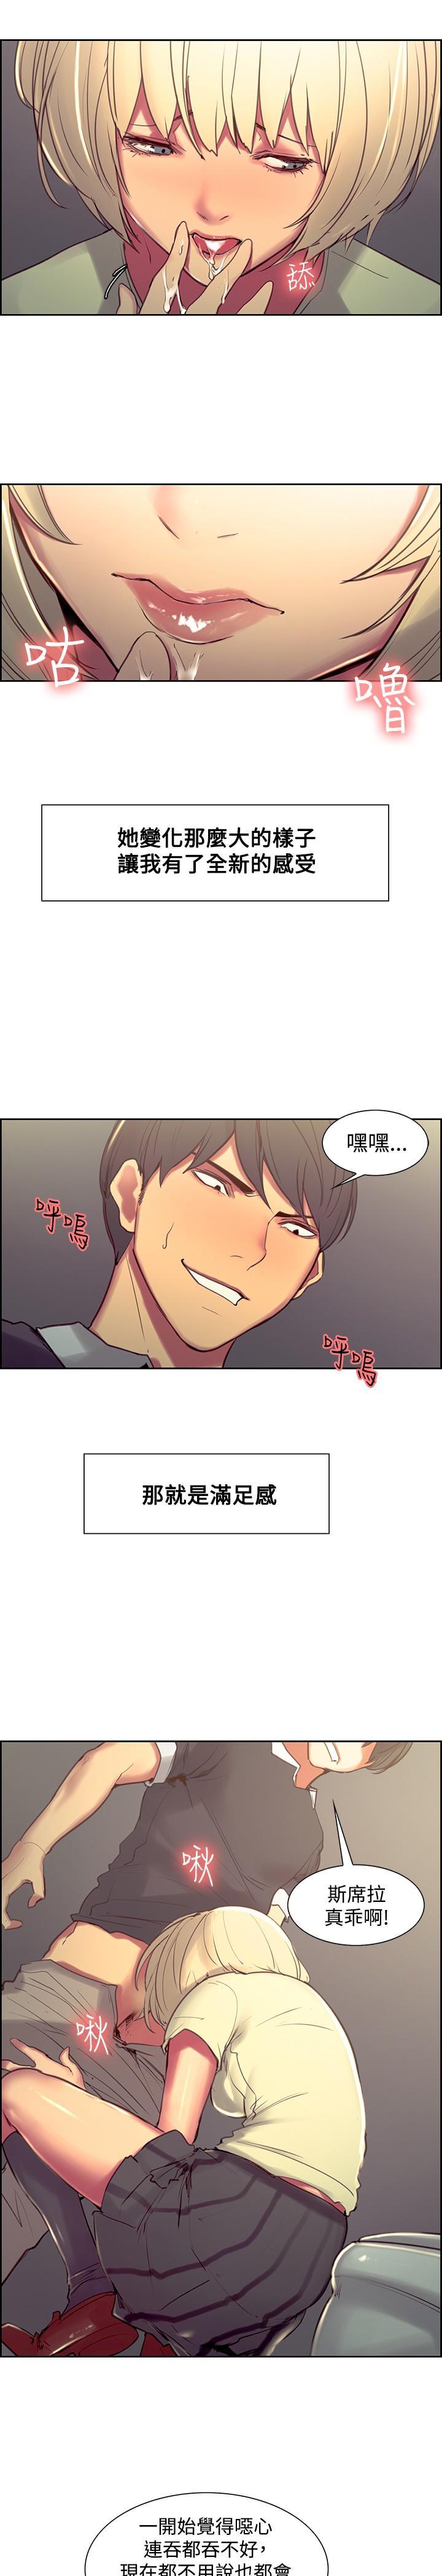 Domesticate the Housekeeper 调教家政妇 ch.29-32 22